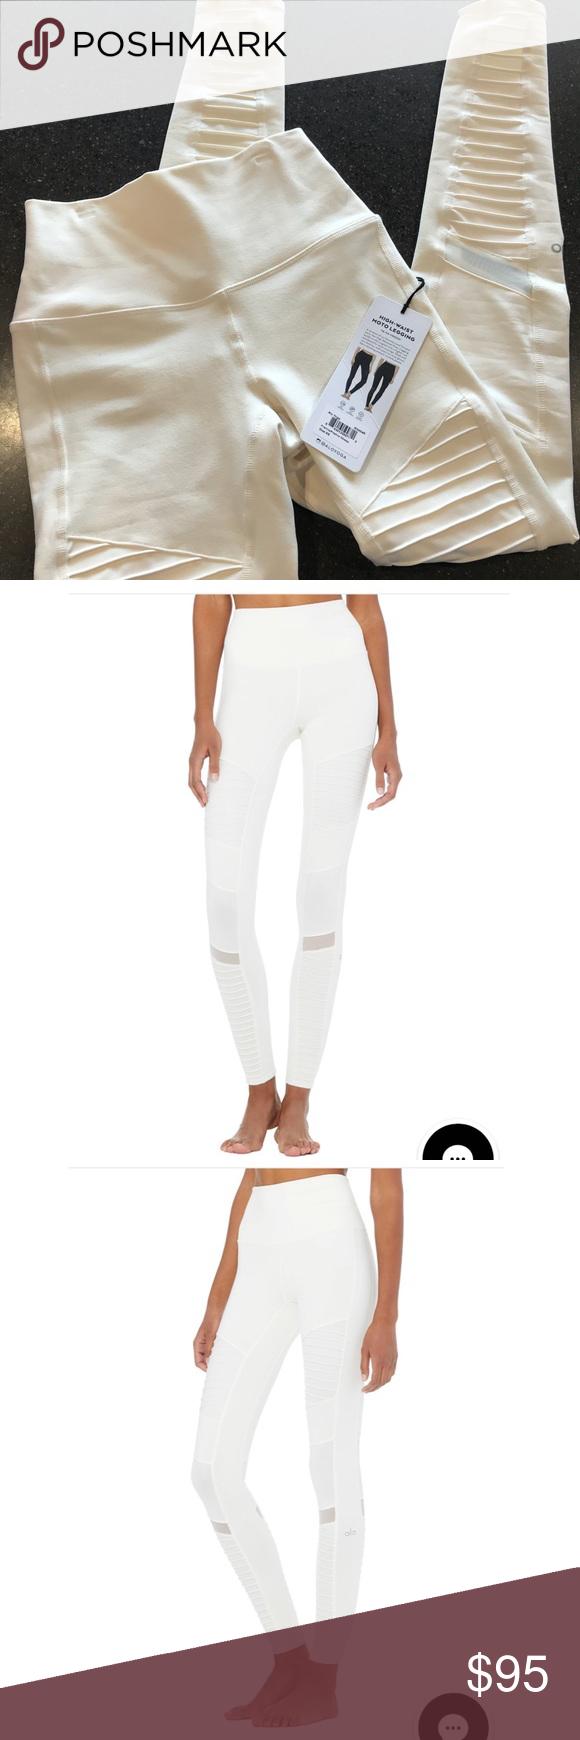 624f8bd8da38c ALO high waist MOTO legging Brand new- tags still attached. Color is  pristine/pristine glossy ALO Yoga Pants Leggings